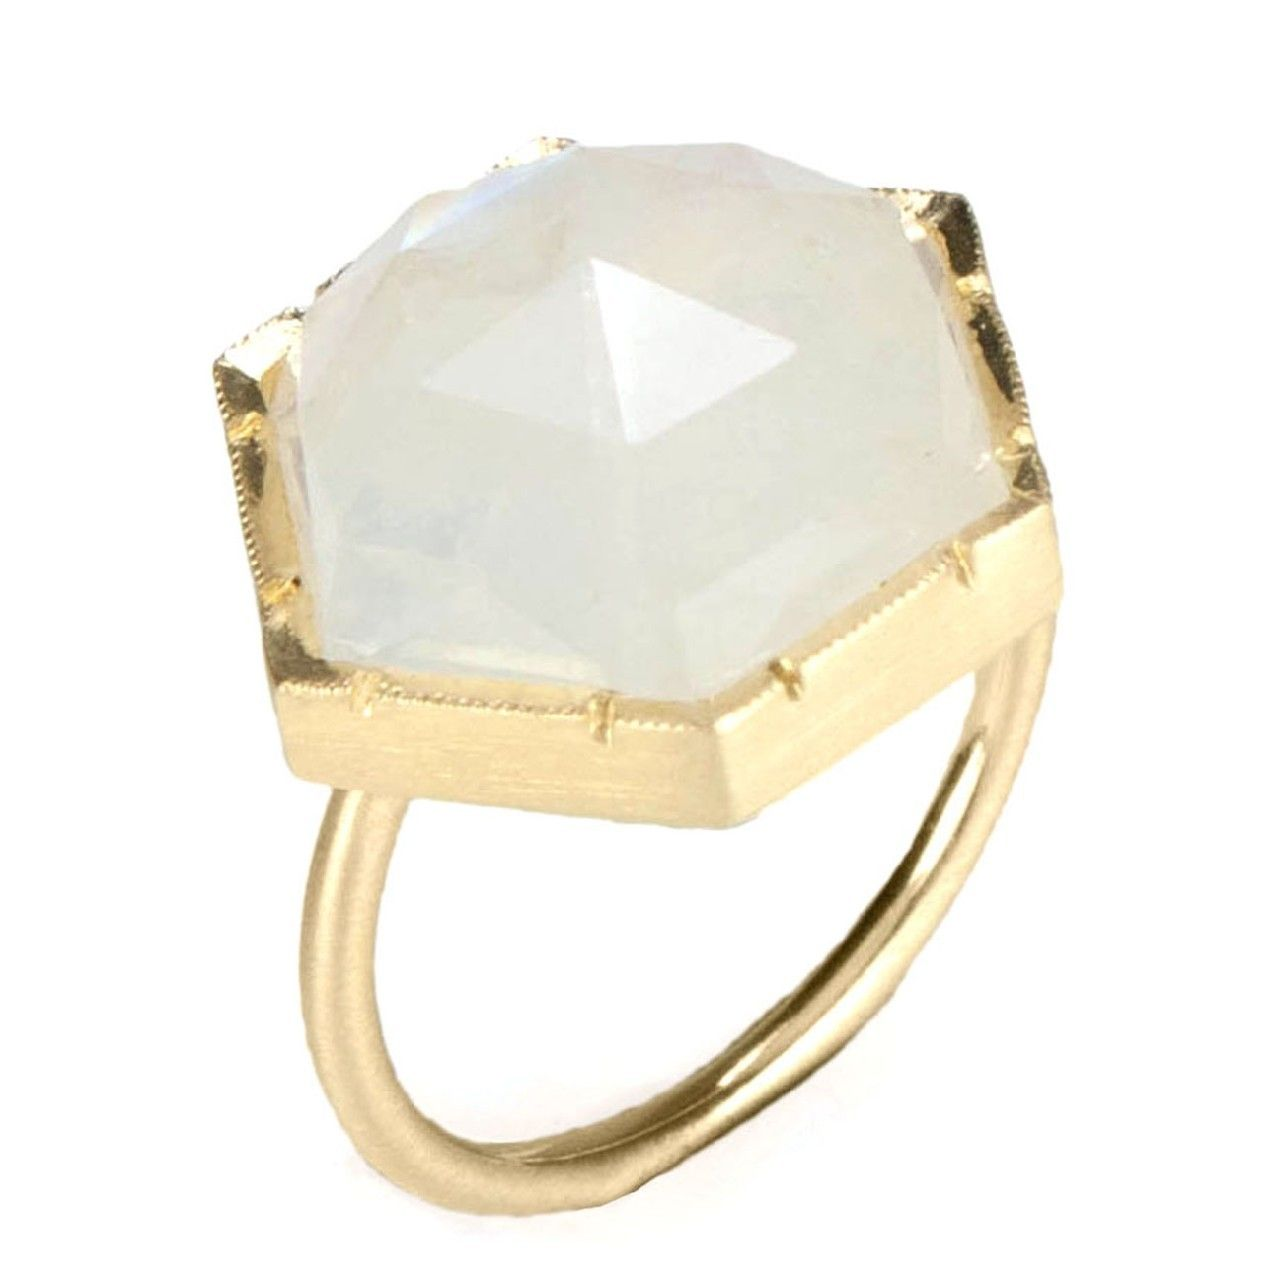 Irene Neuwirth - Hexagon Moonstone Ring (Moonstone) - Hirshleifers #ILOVEHIRSHLEIFERS